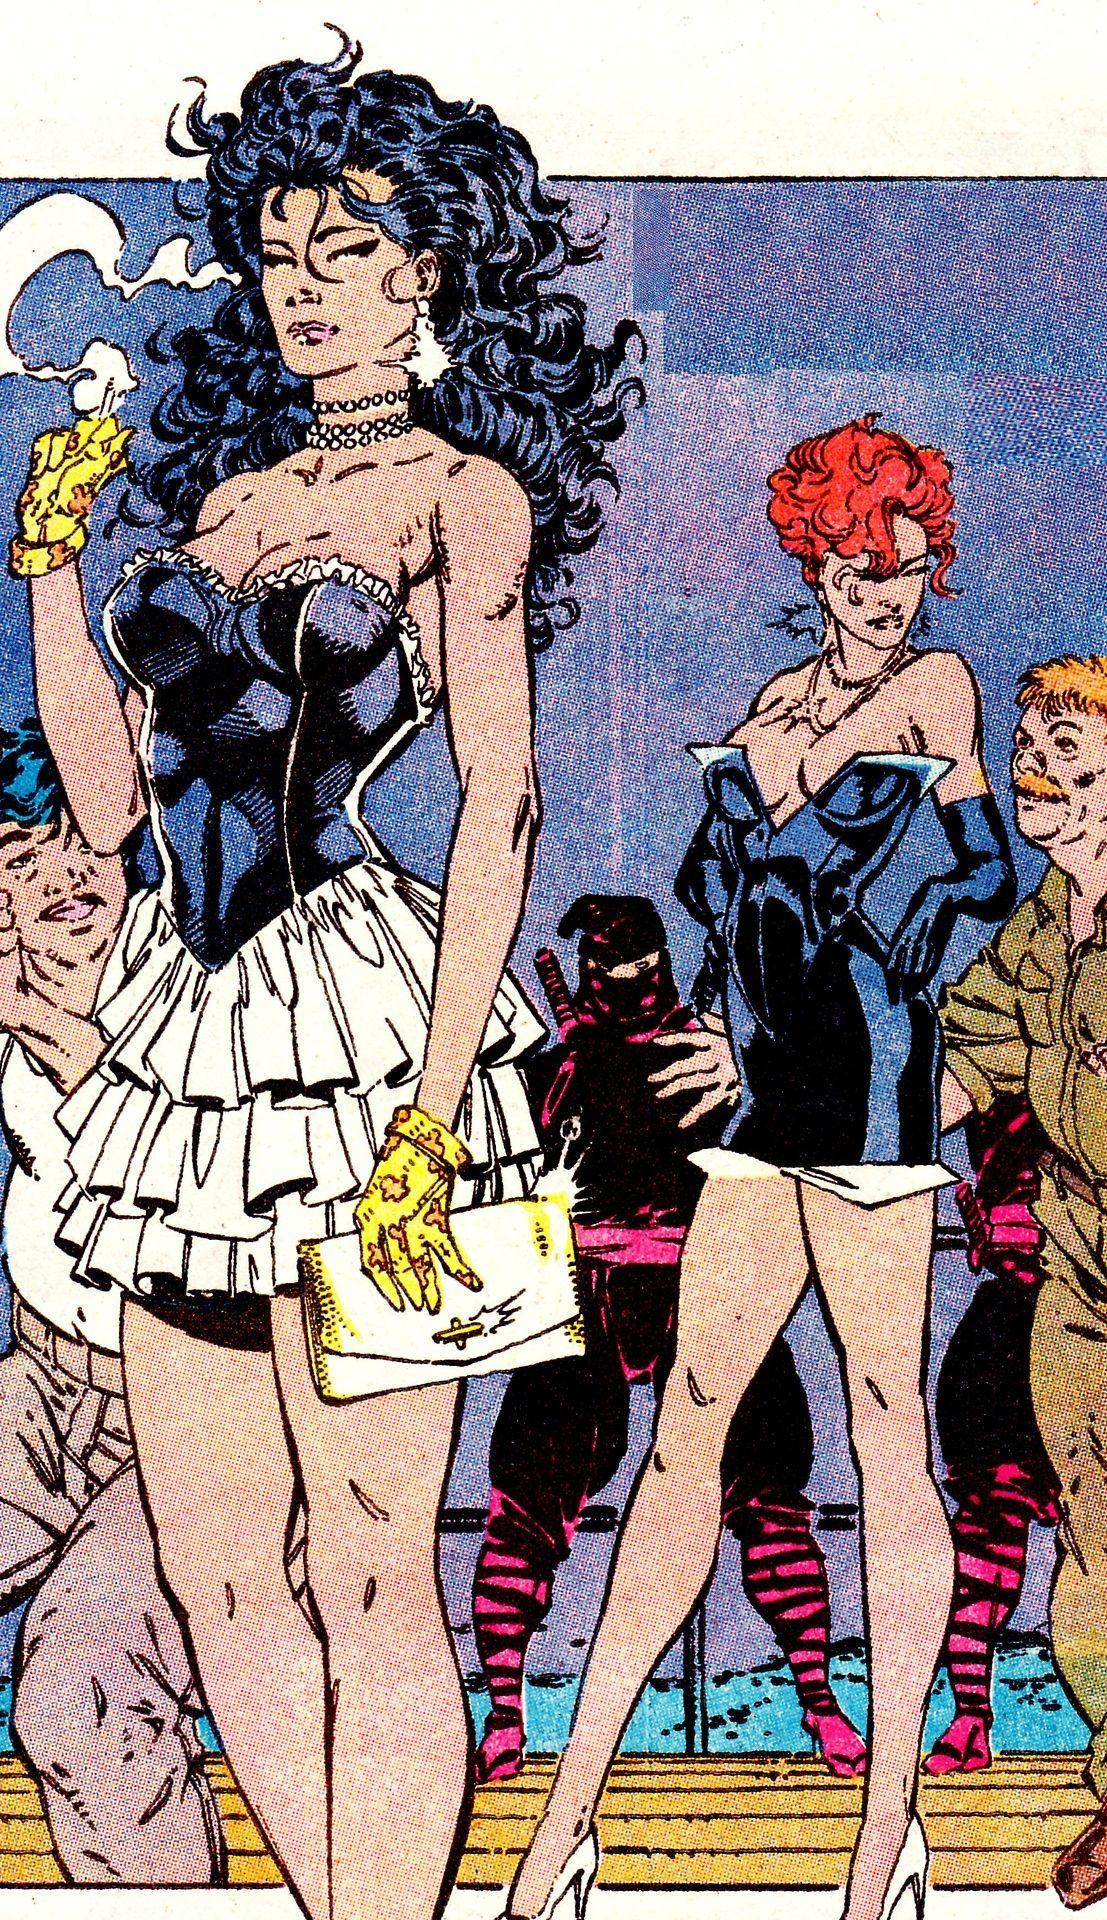 Psylocke & Black Widow by Jim Lee marvelcomicuniverse #marveldccomics #marvelheroes #bdcomics #comicsgirls #marvelcinematicuniverse #animecomics #marvelcomiccharacter #comicbookcharacters